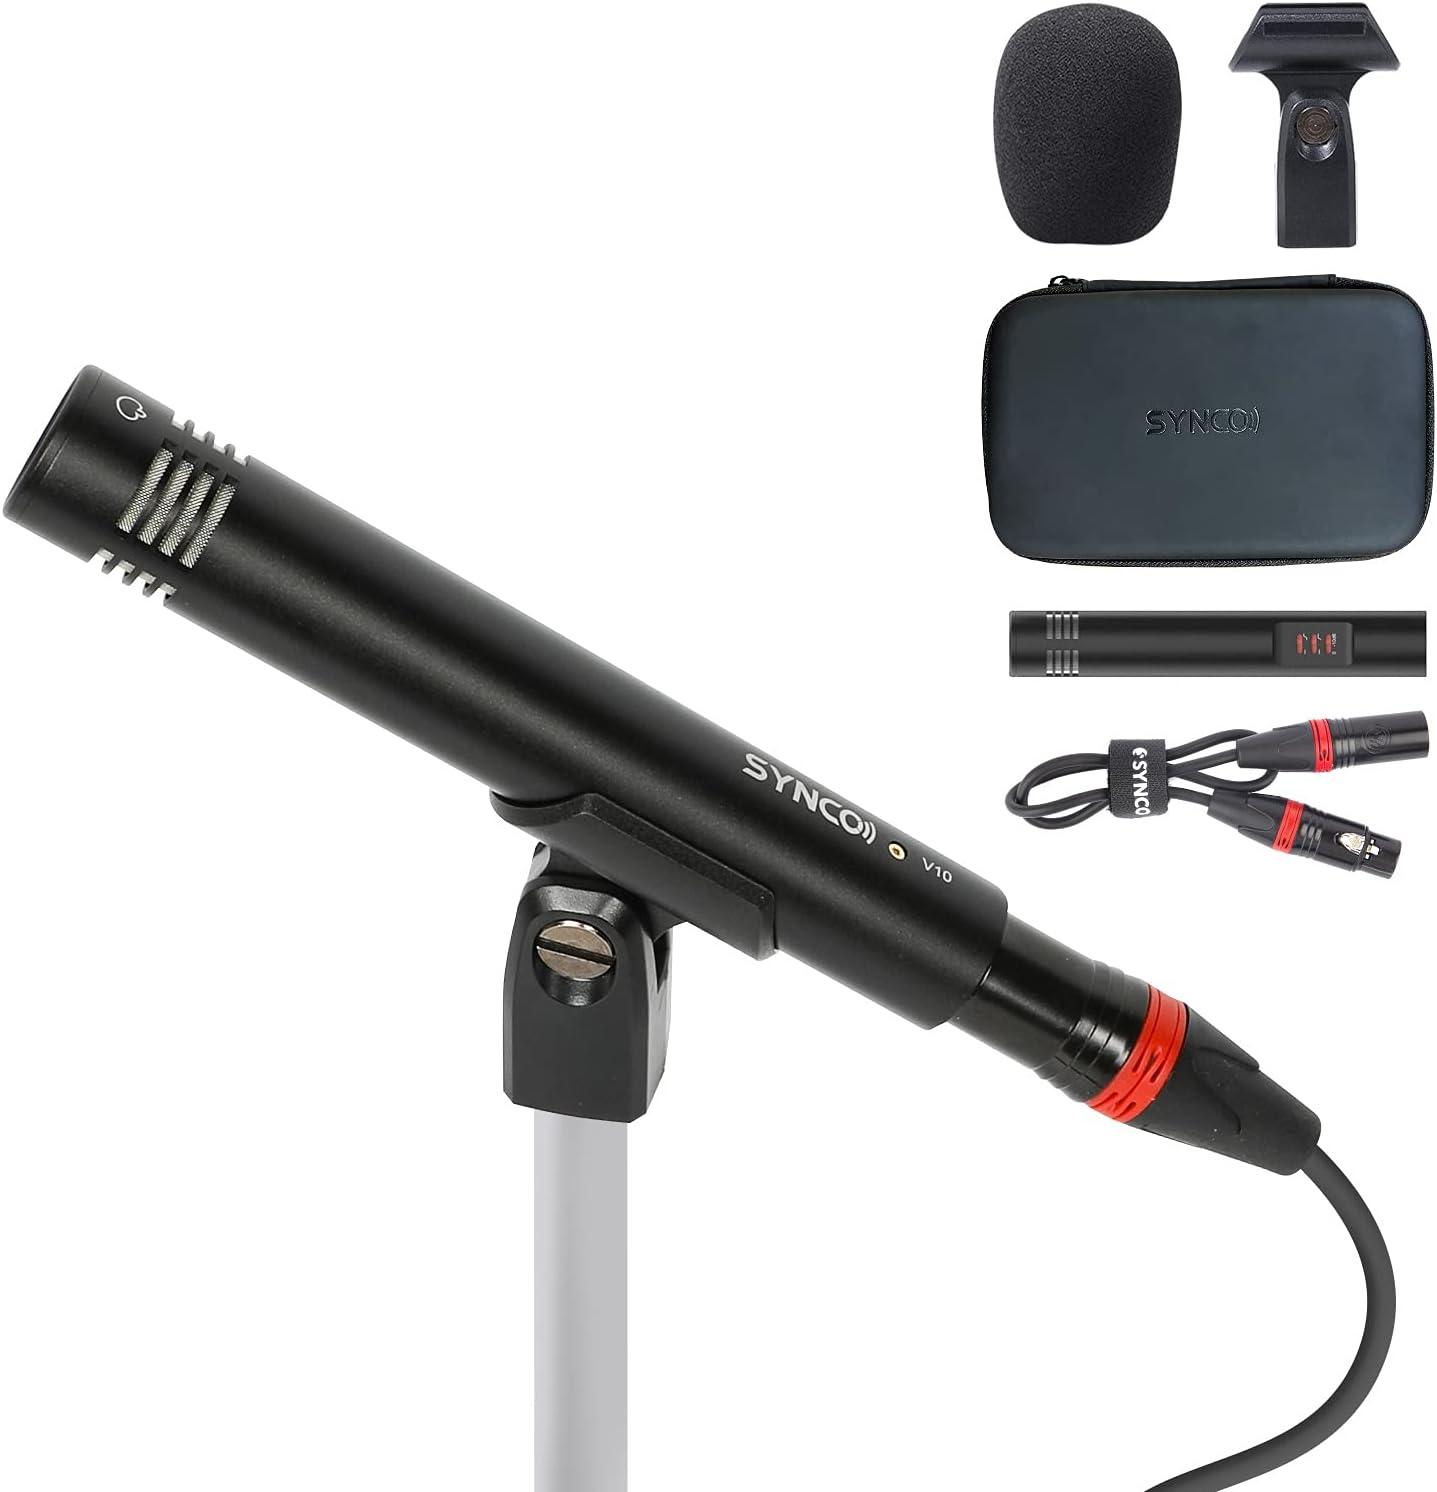 Small Diaphragm Special Campaign Condenser Microphone C V10 Max 88% OFF SYNCO Hyper-Cardioid